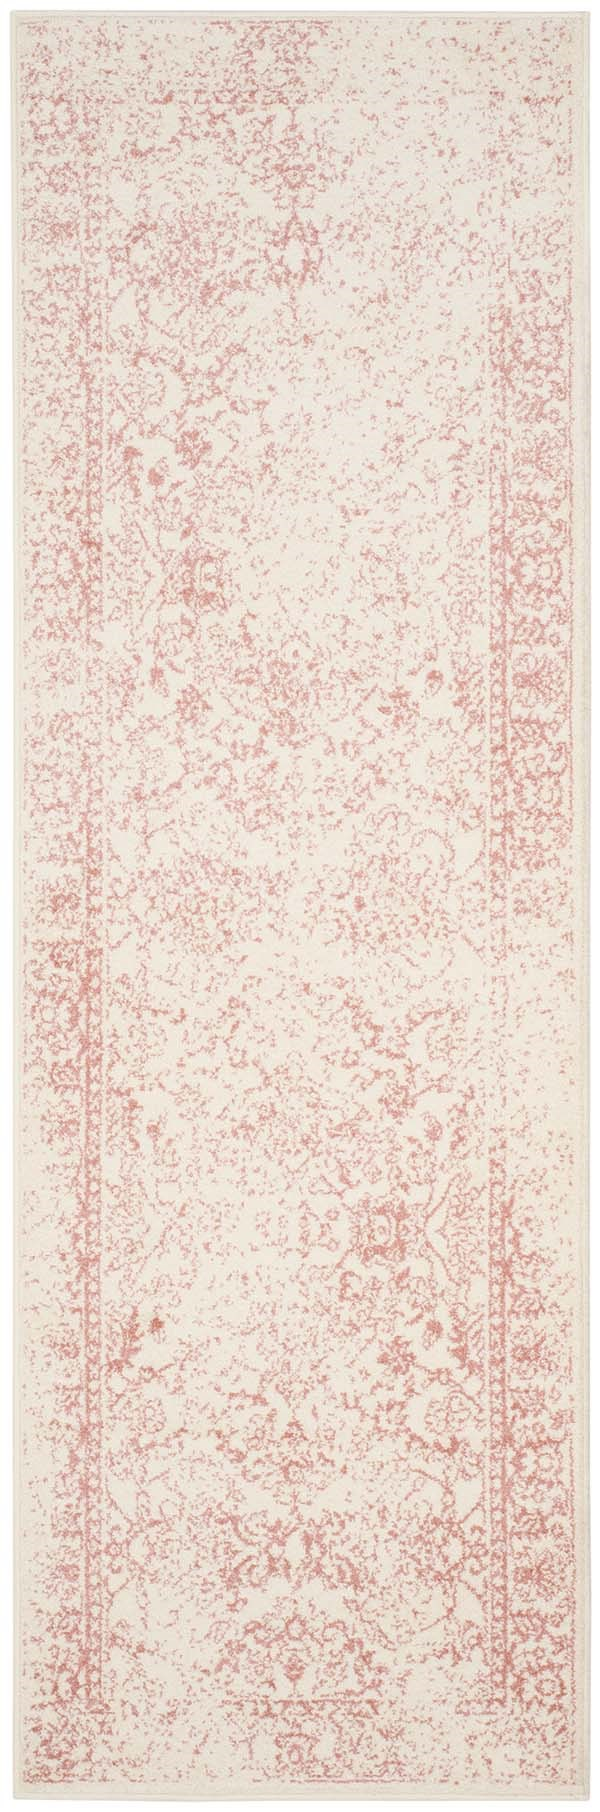 Ivory, Rose (H) Vintage / Overdyed Area Rug